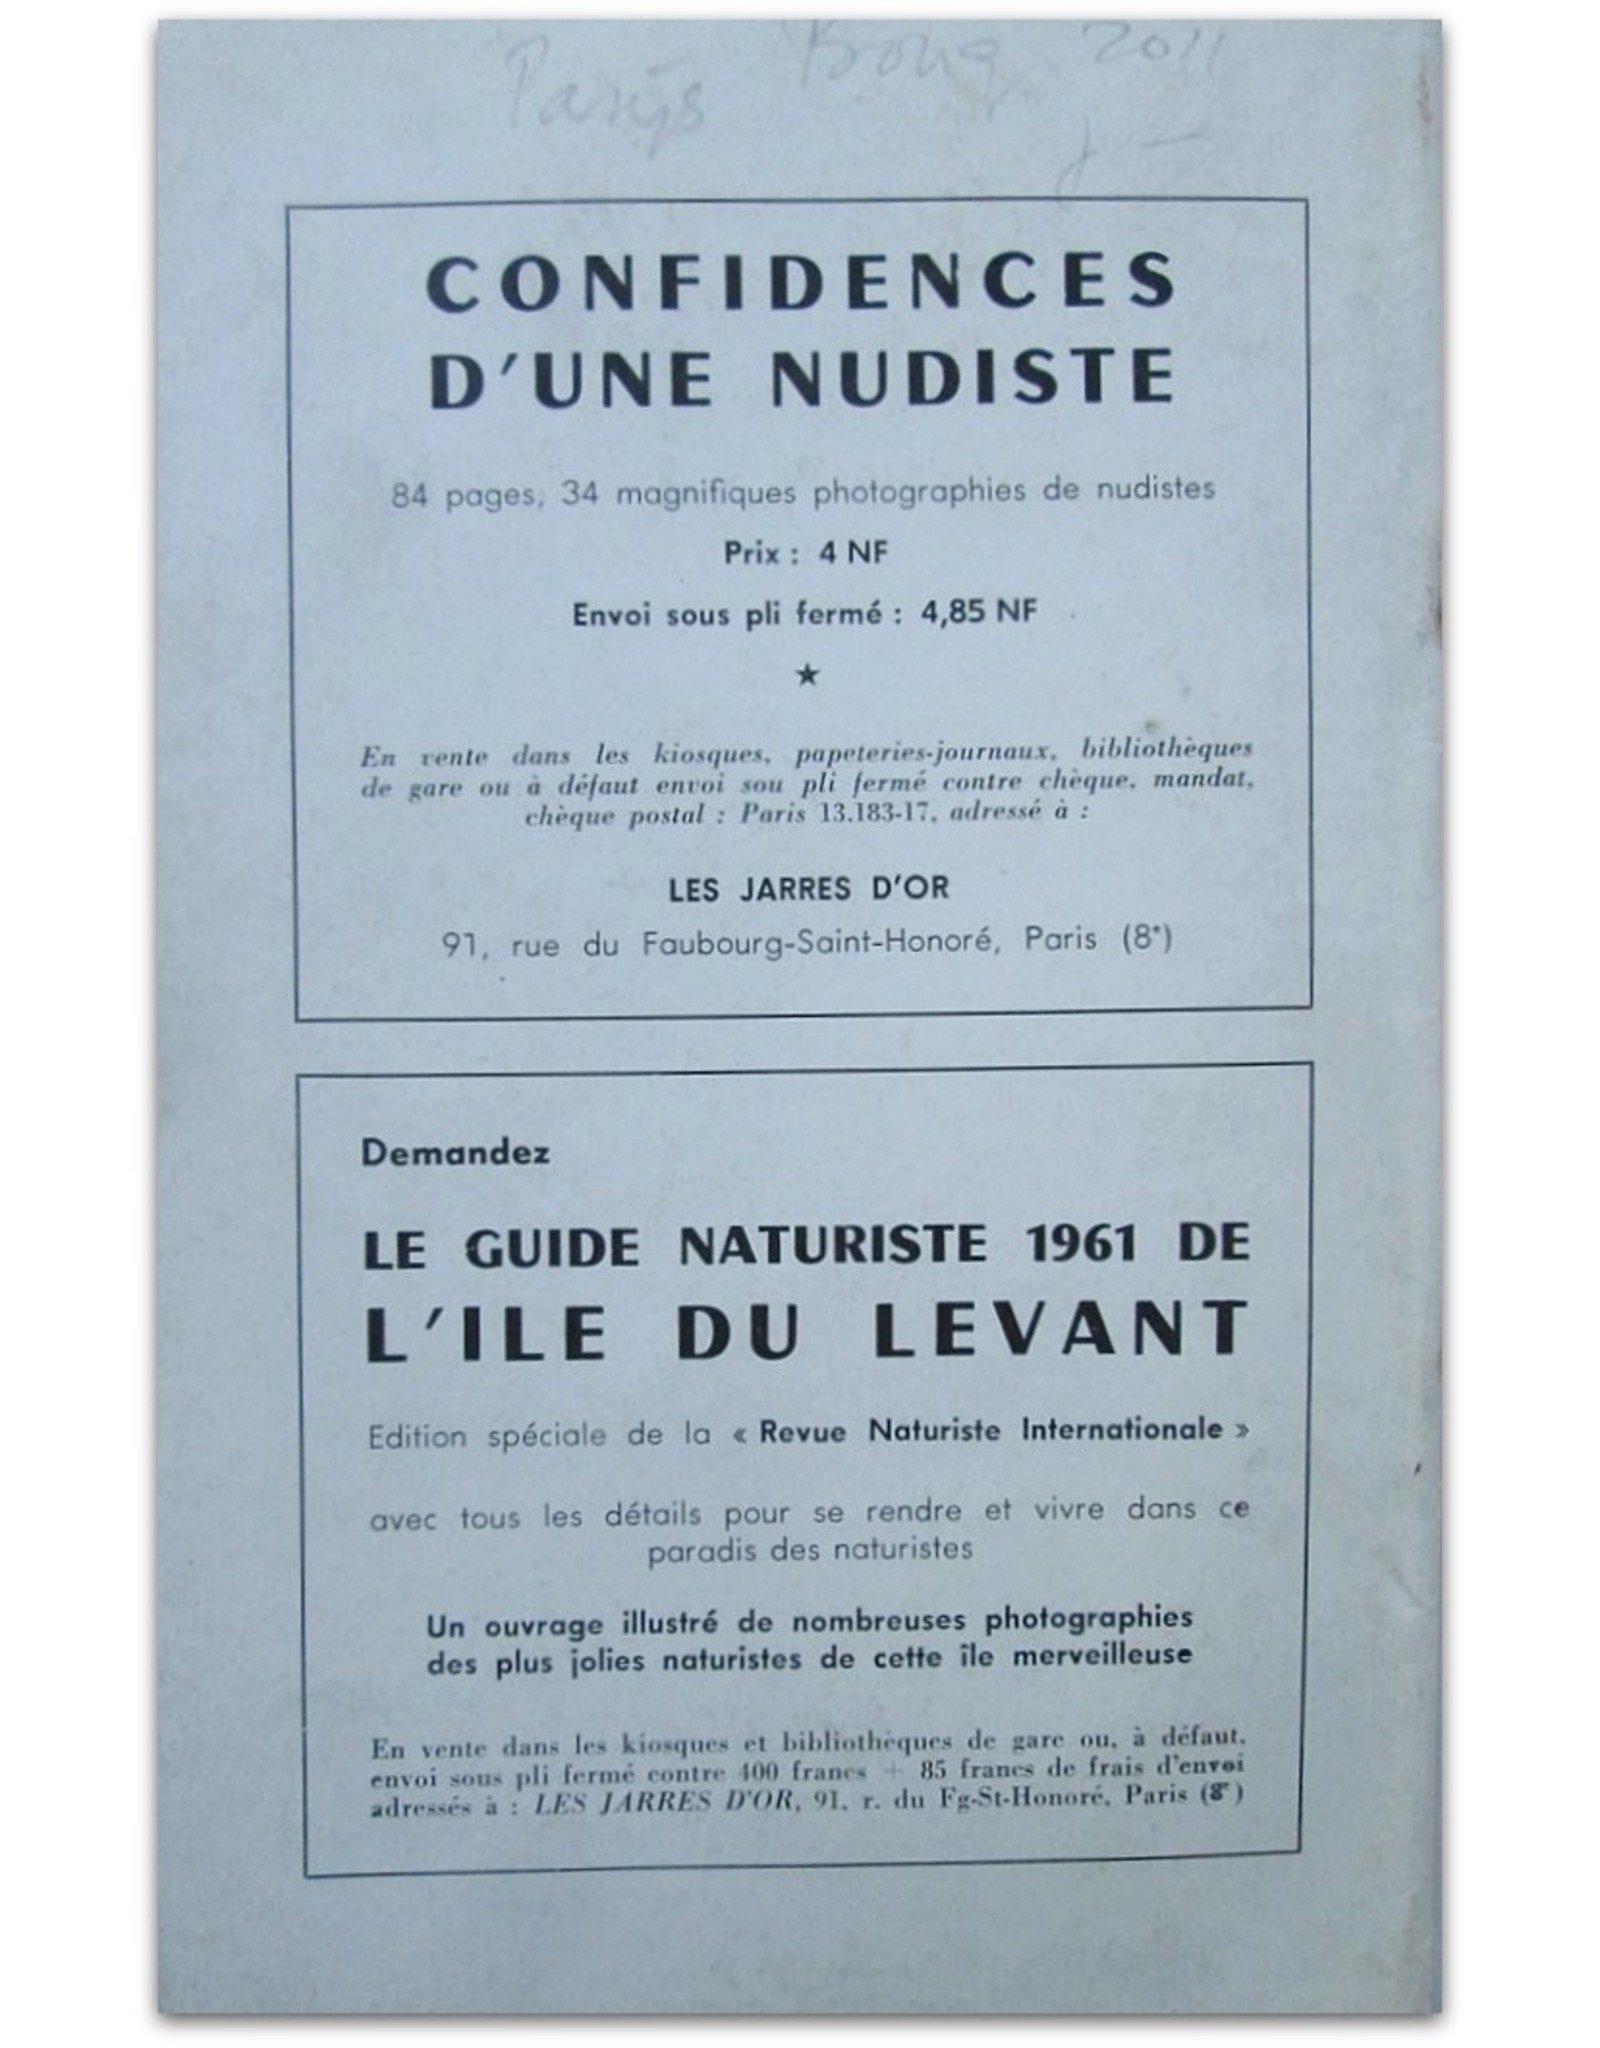 Jean Gantois - Ma femme est nudiste... - Édition spéciale de la revue naturiste internationale